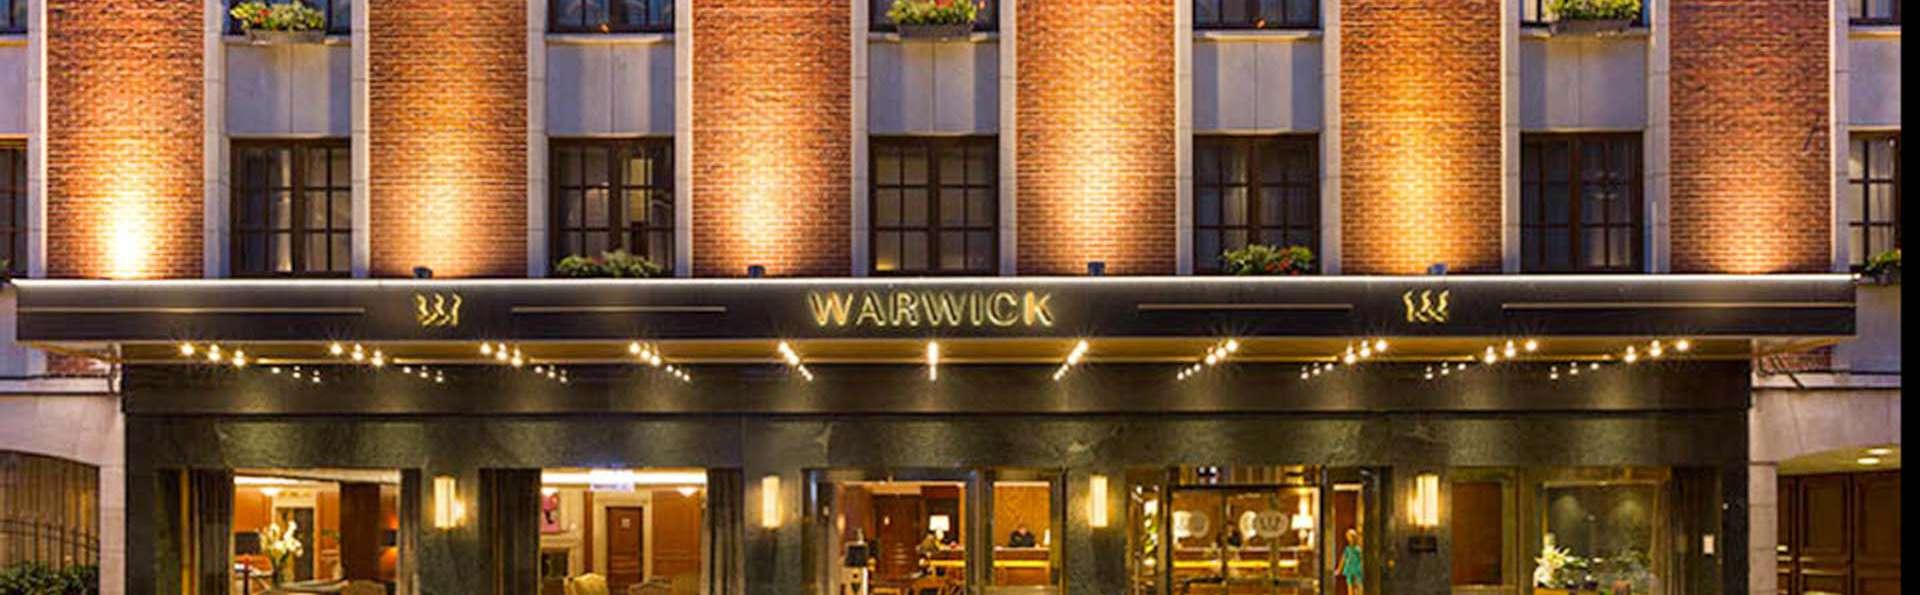 Warwick Brussels  - EDIT_EXTERIOR_FRONT_01.jpg